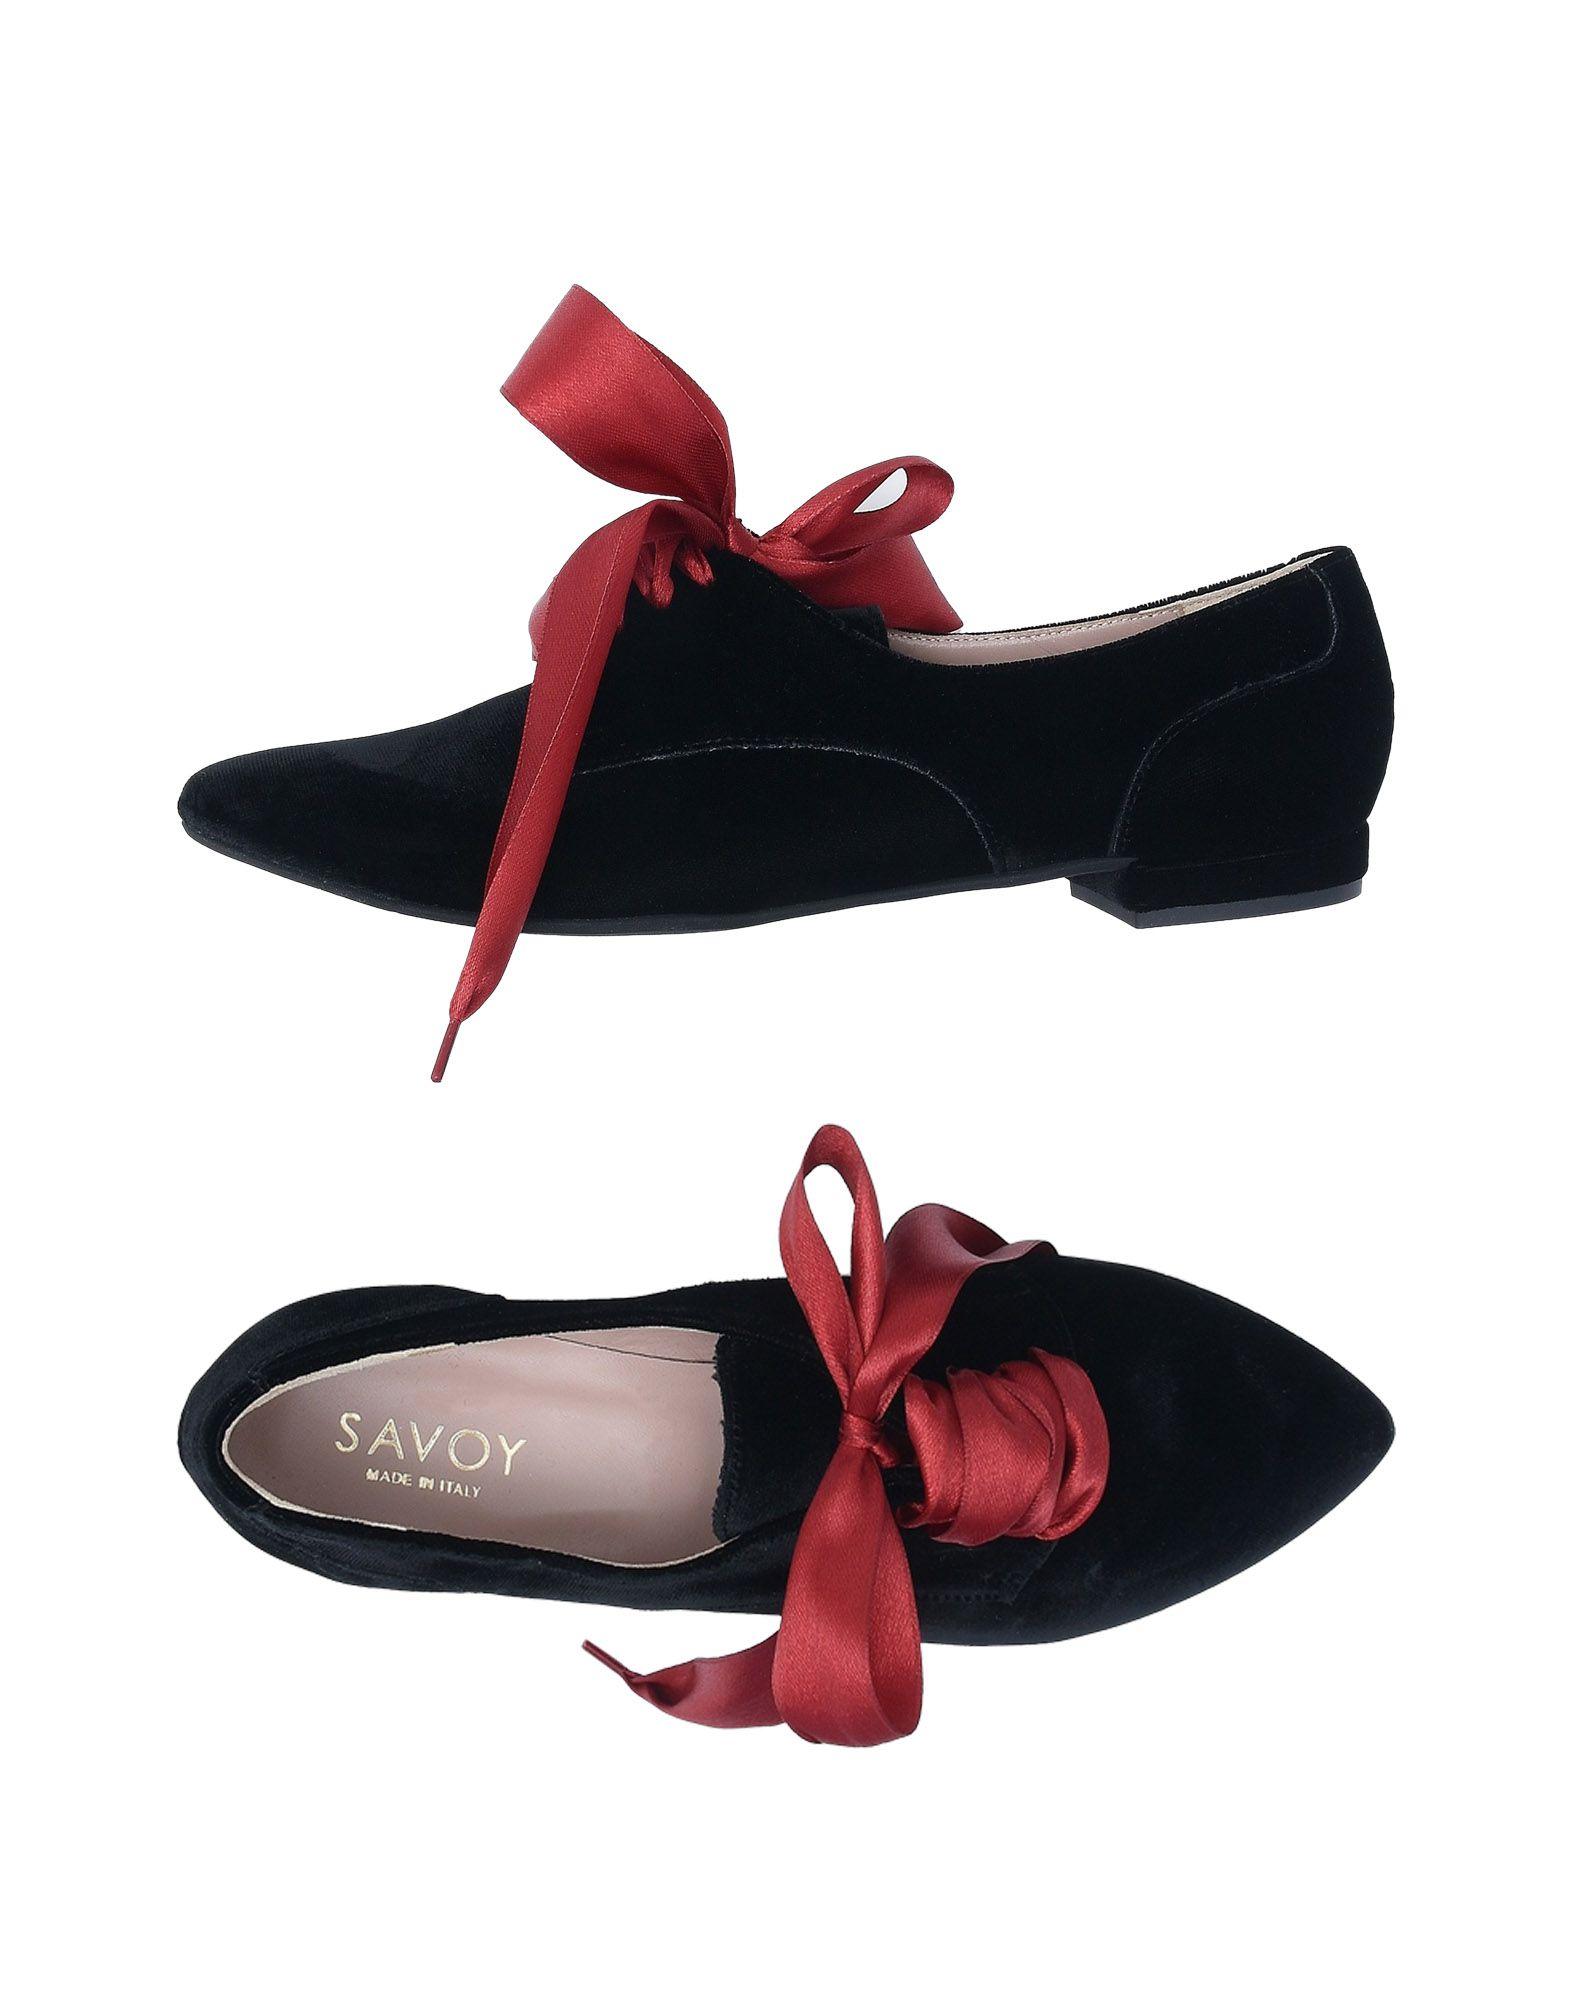 Фото - SAVOY Обувь на шнурках обувь на высокой платформе dkny